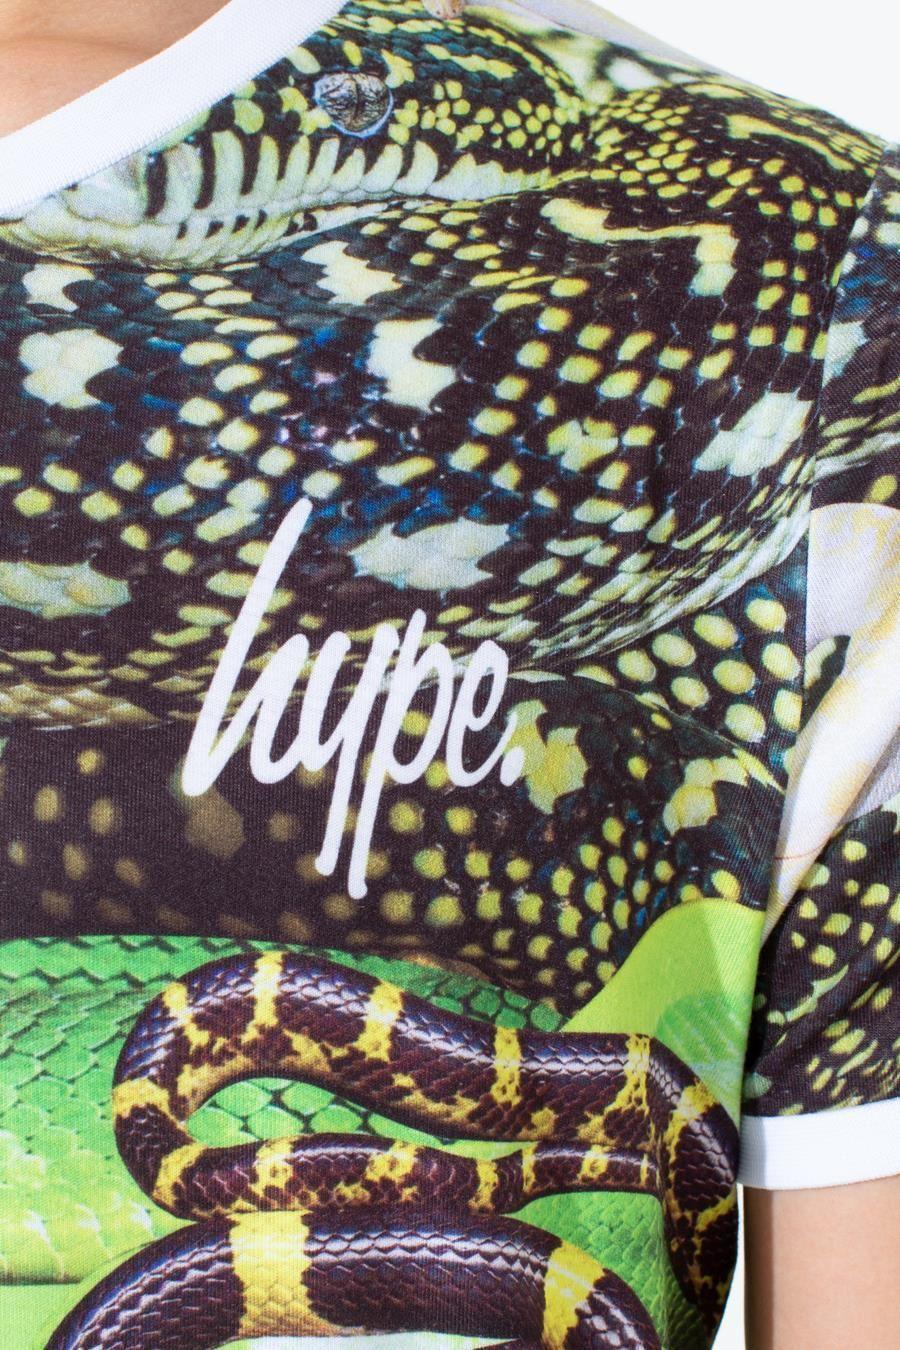 HYPE SNAKE PIT KIDS T-SHIRT 16Y